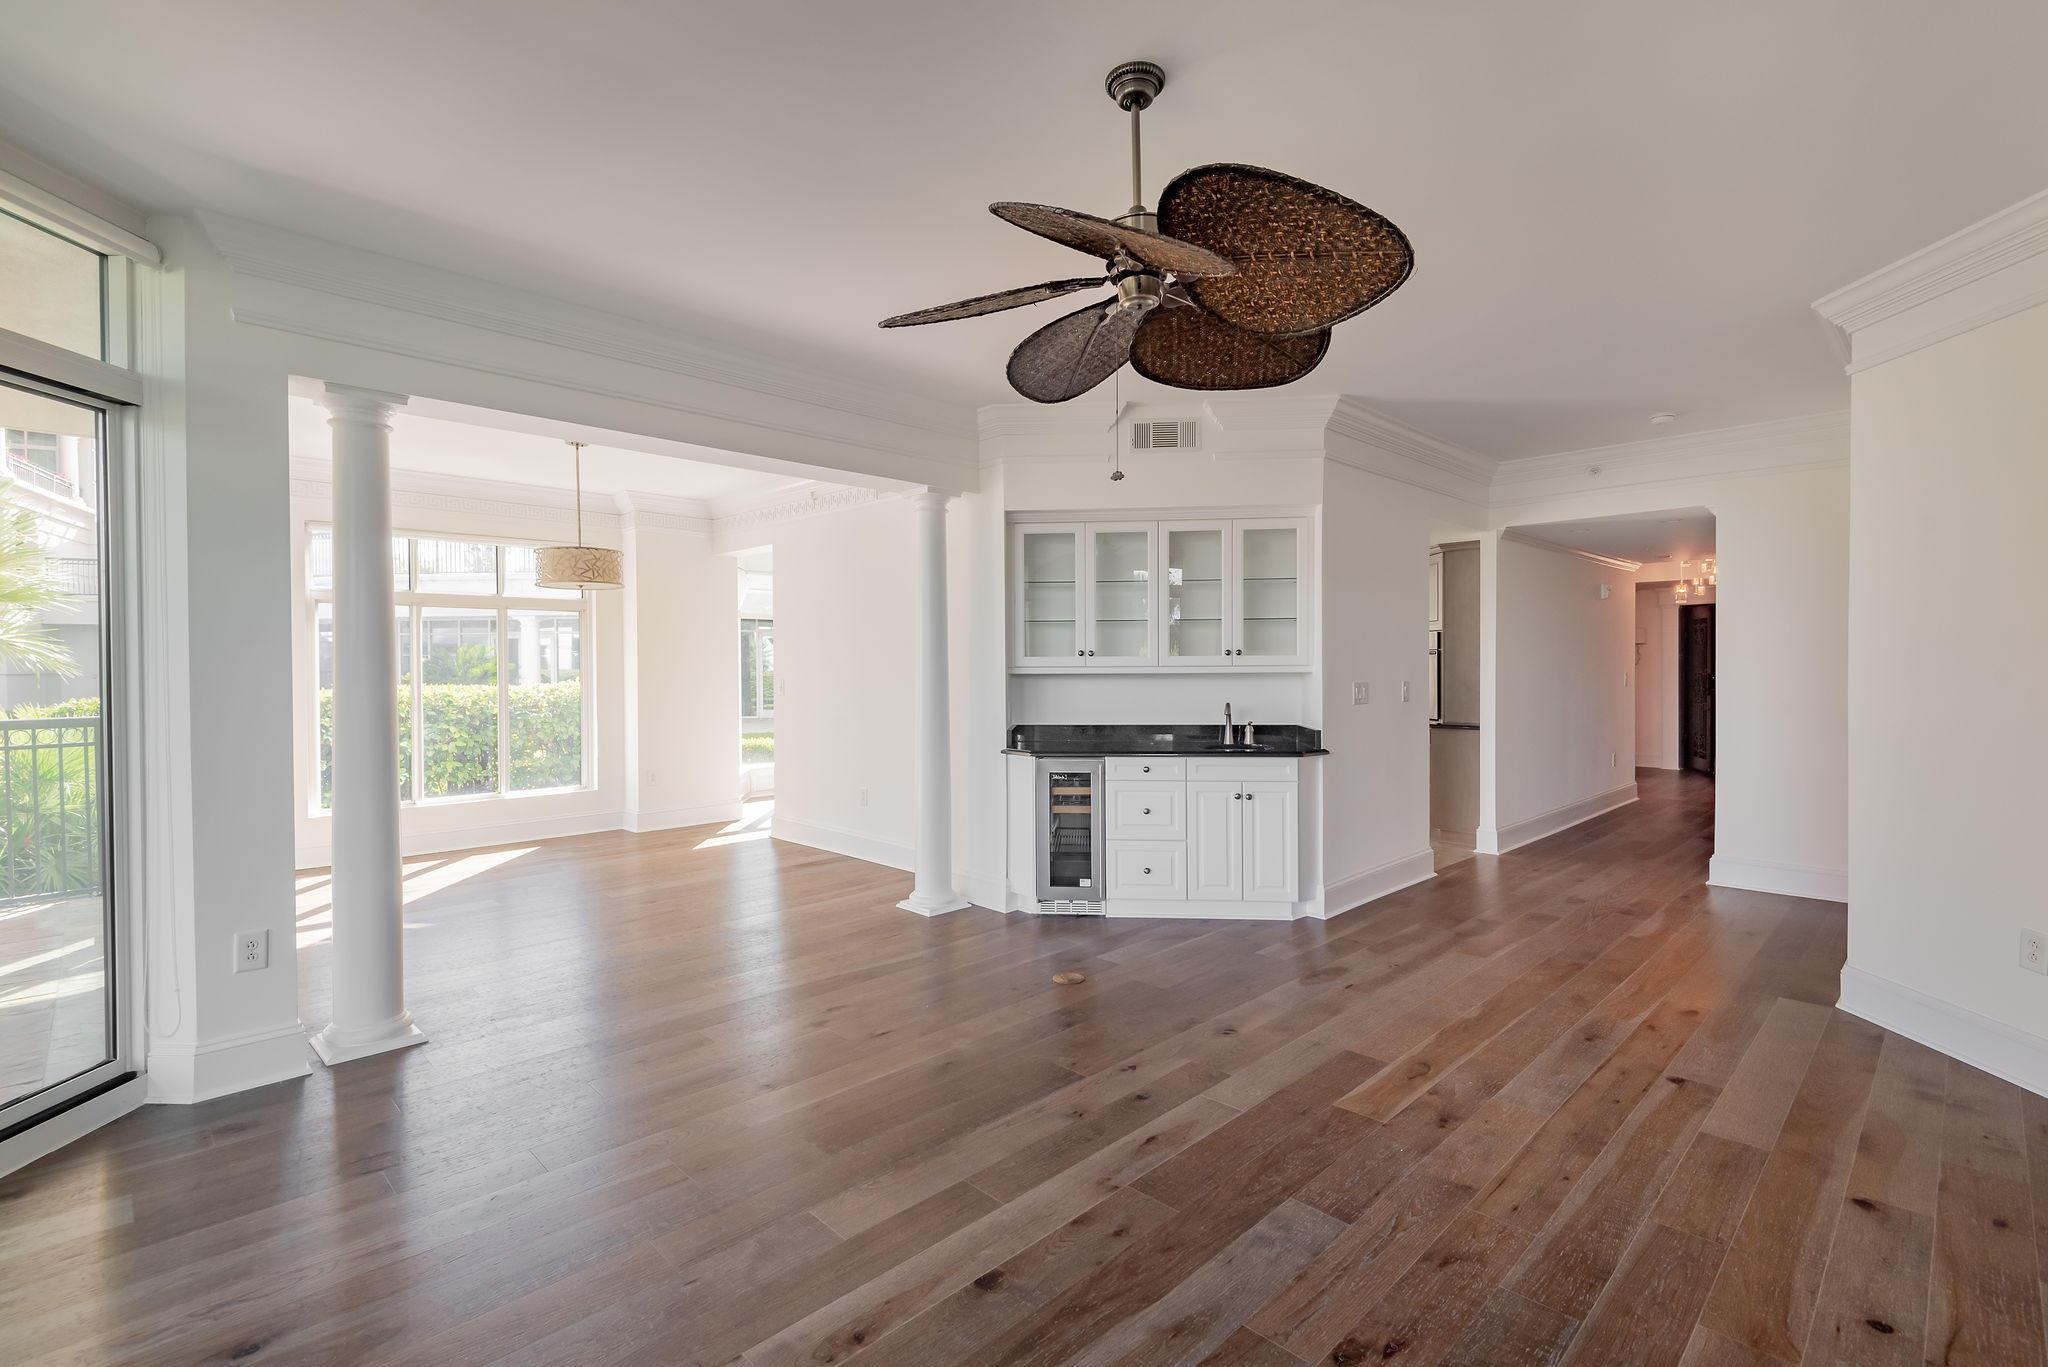 Renaissance On Chas Harbor Homes For Sale - 211 Plaza, Mount Pleasant, SC - 7